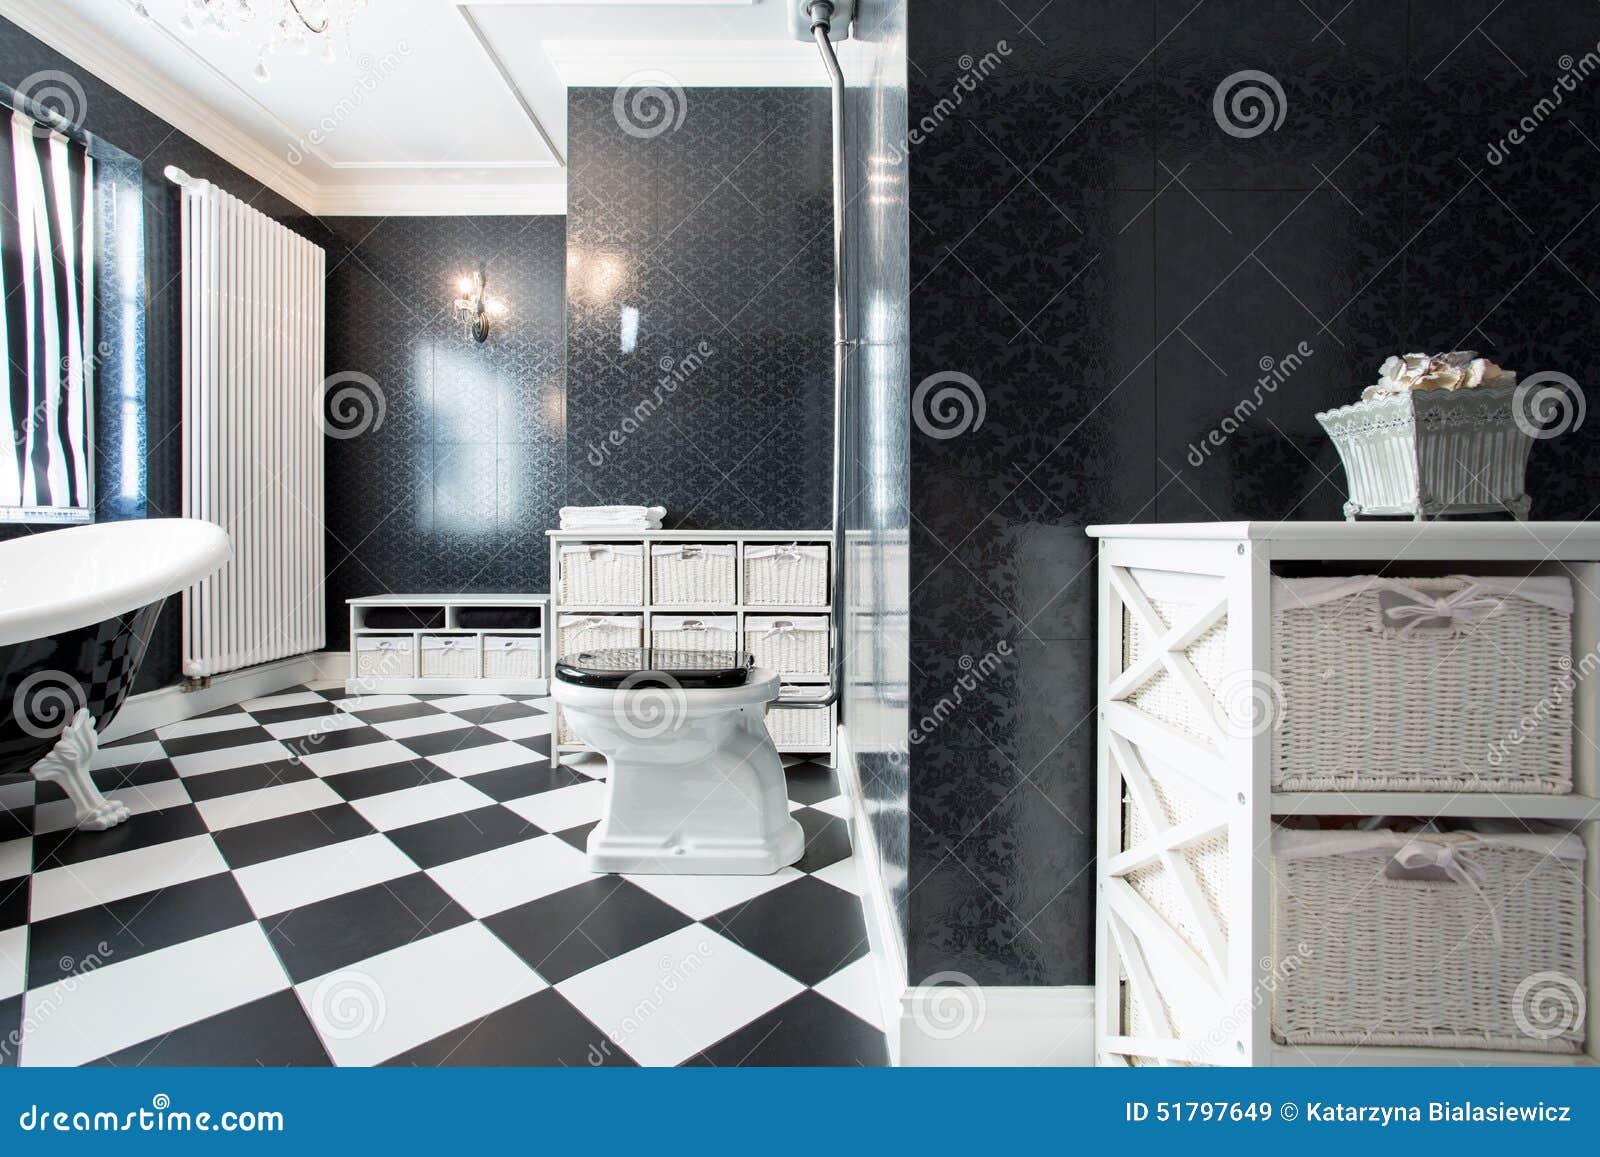 bagni moderni neri tags » bagni moderni neri sanitari bagno .... hope - rab arredobagno moderno ...